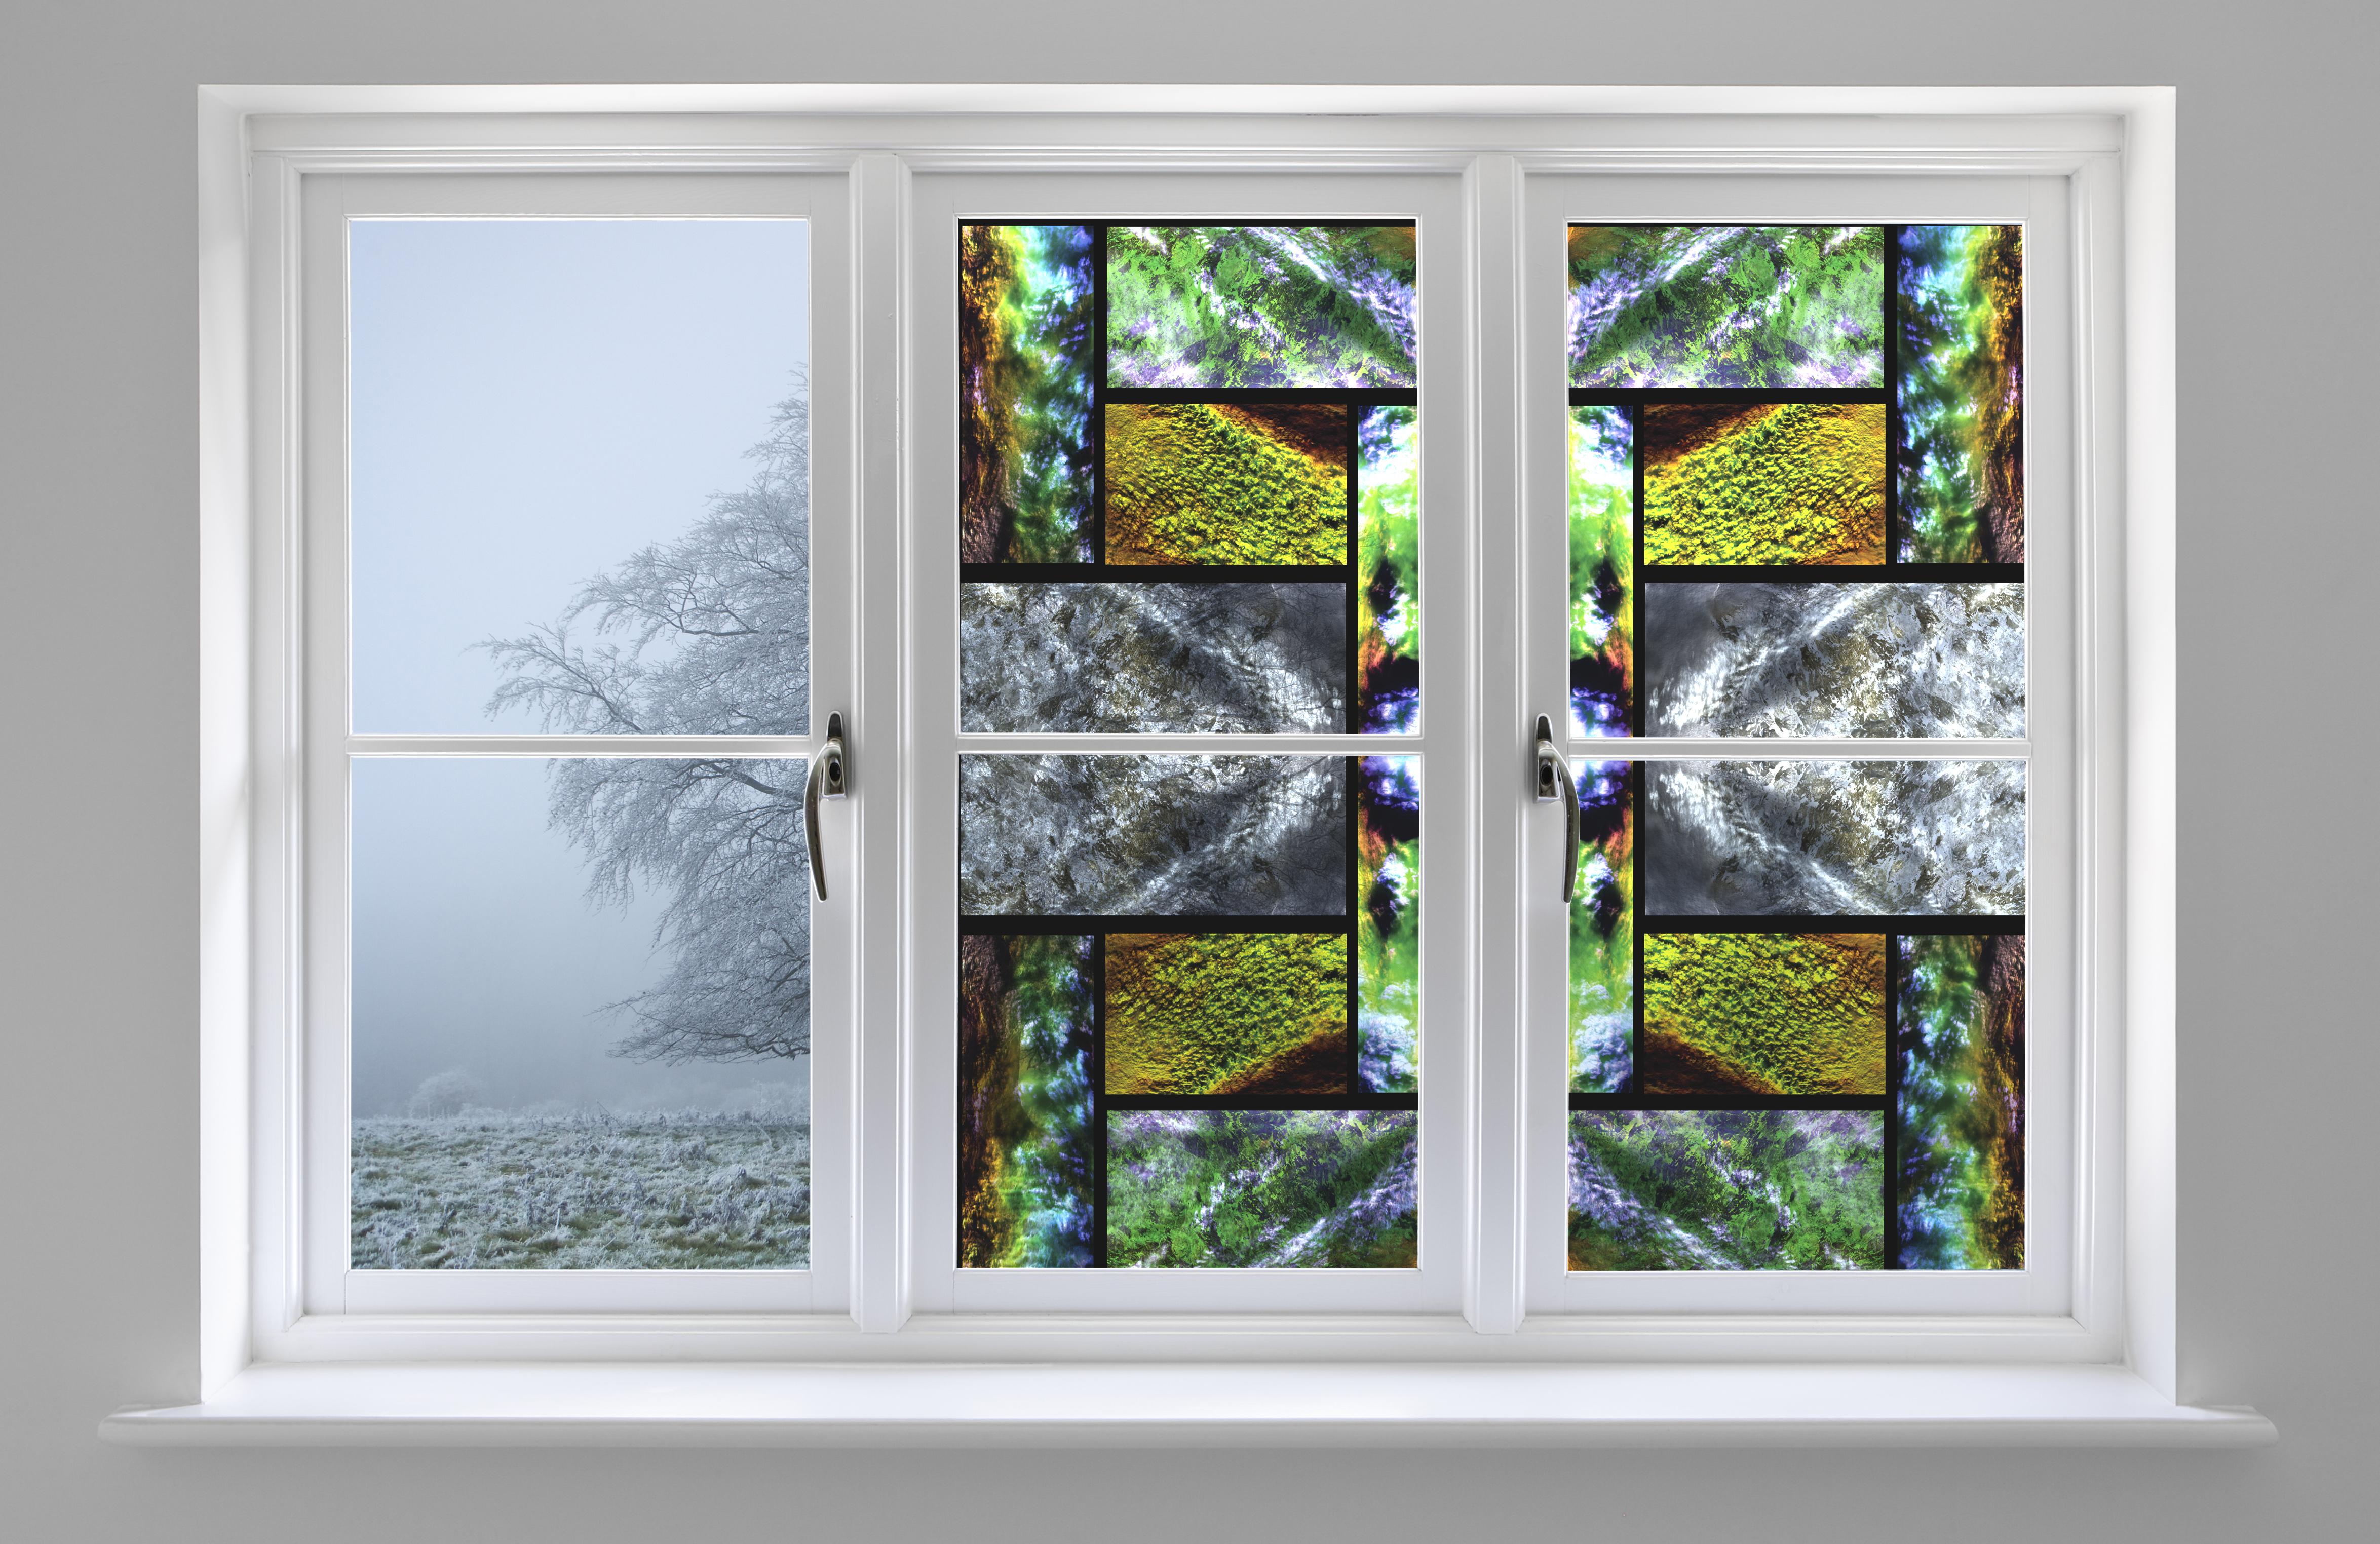 Sxeg 4849 Stained Glass Canada Decorative Films Llc